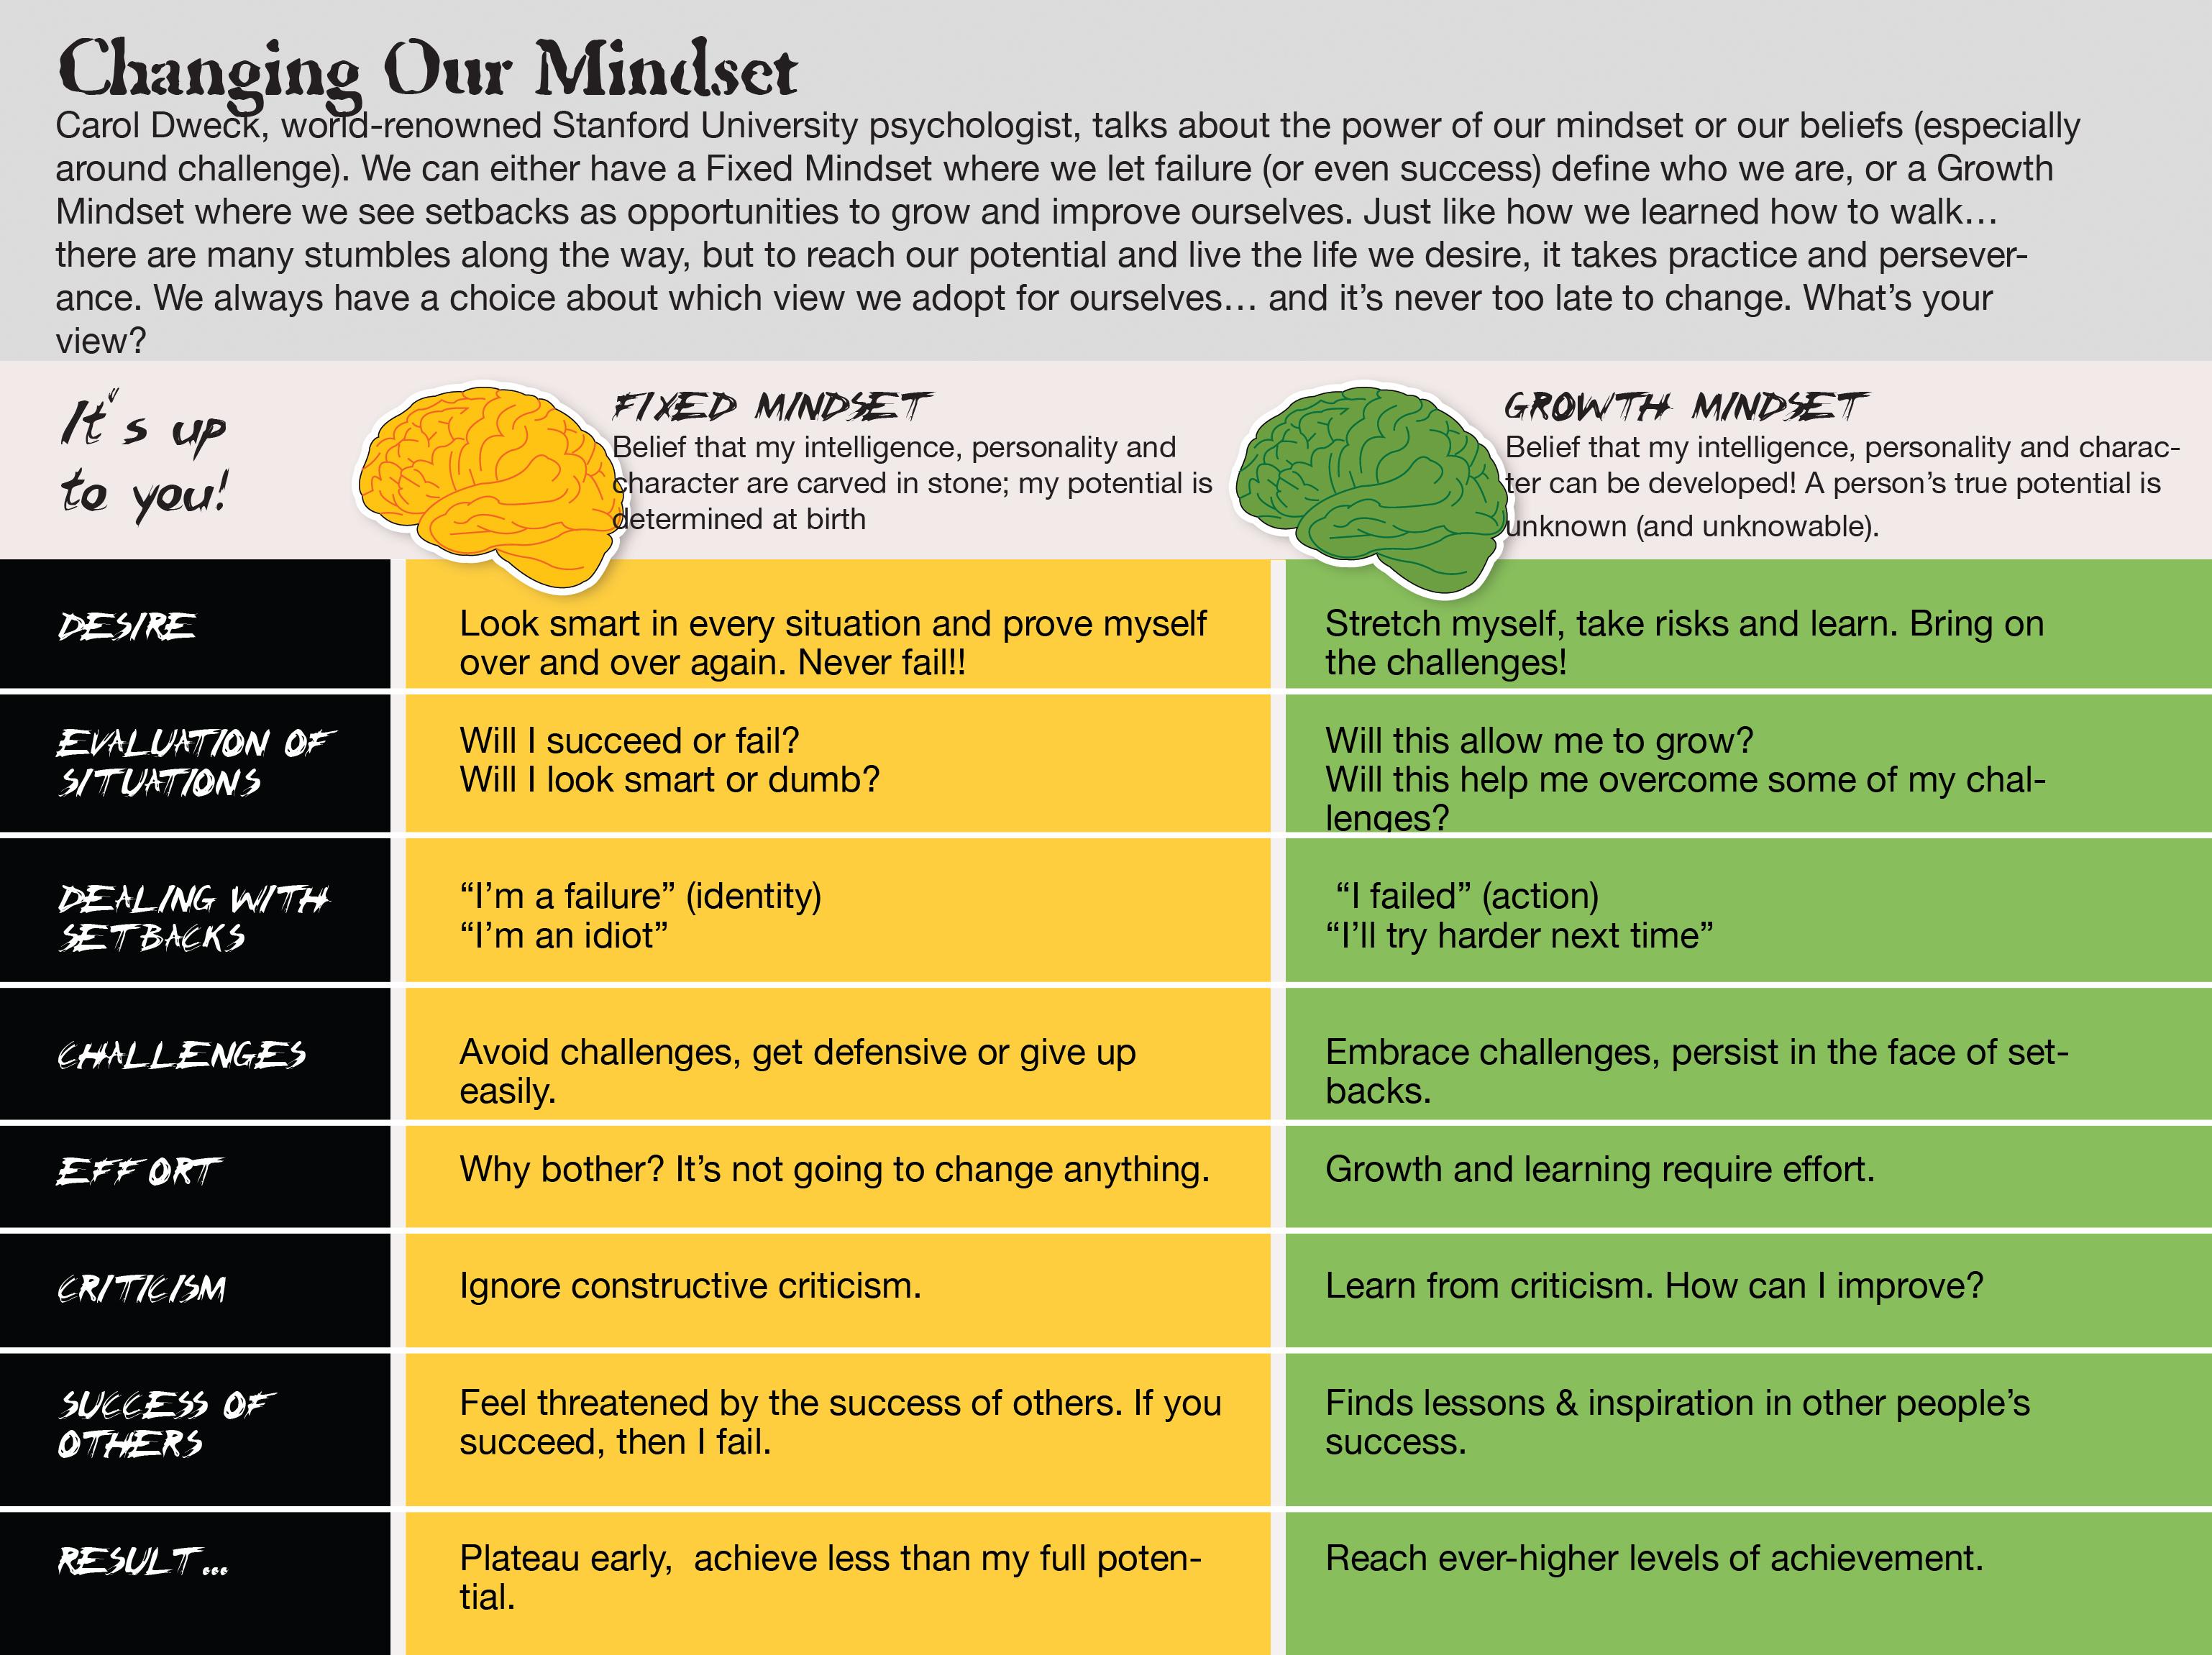 Esl Student Motivation And Growth Mindset